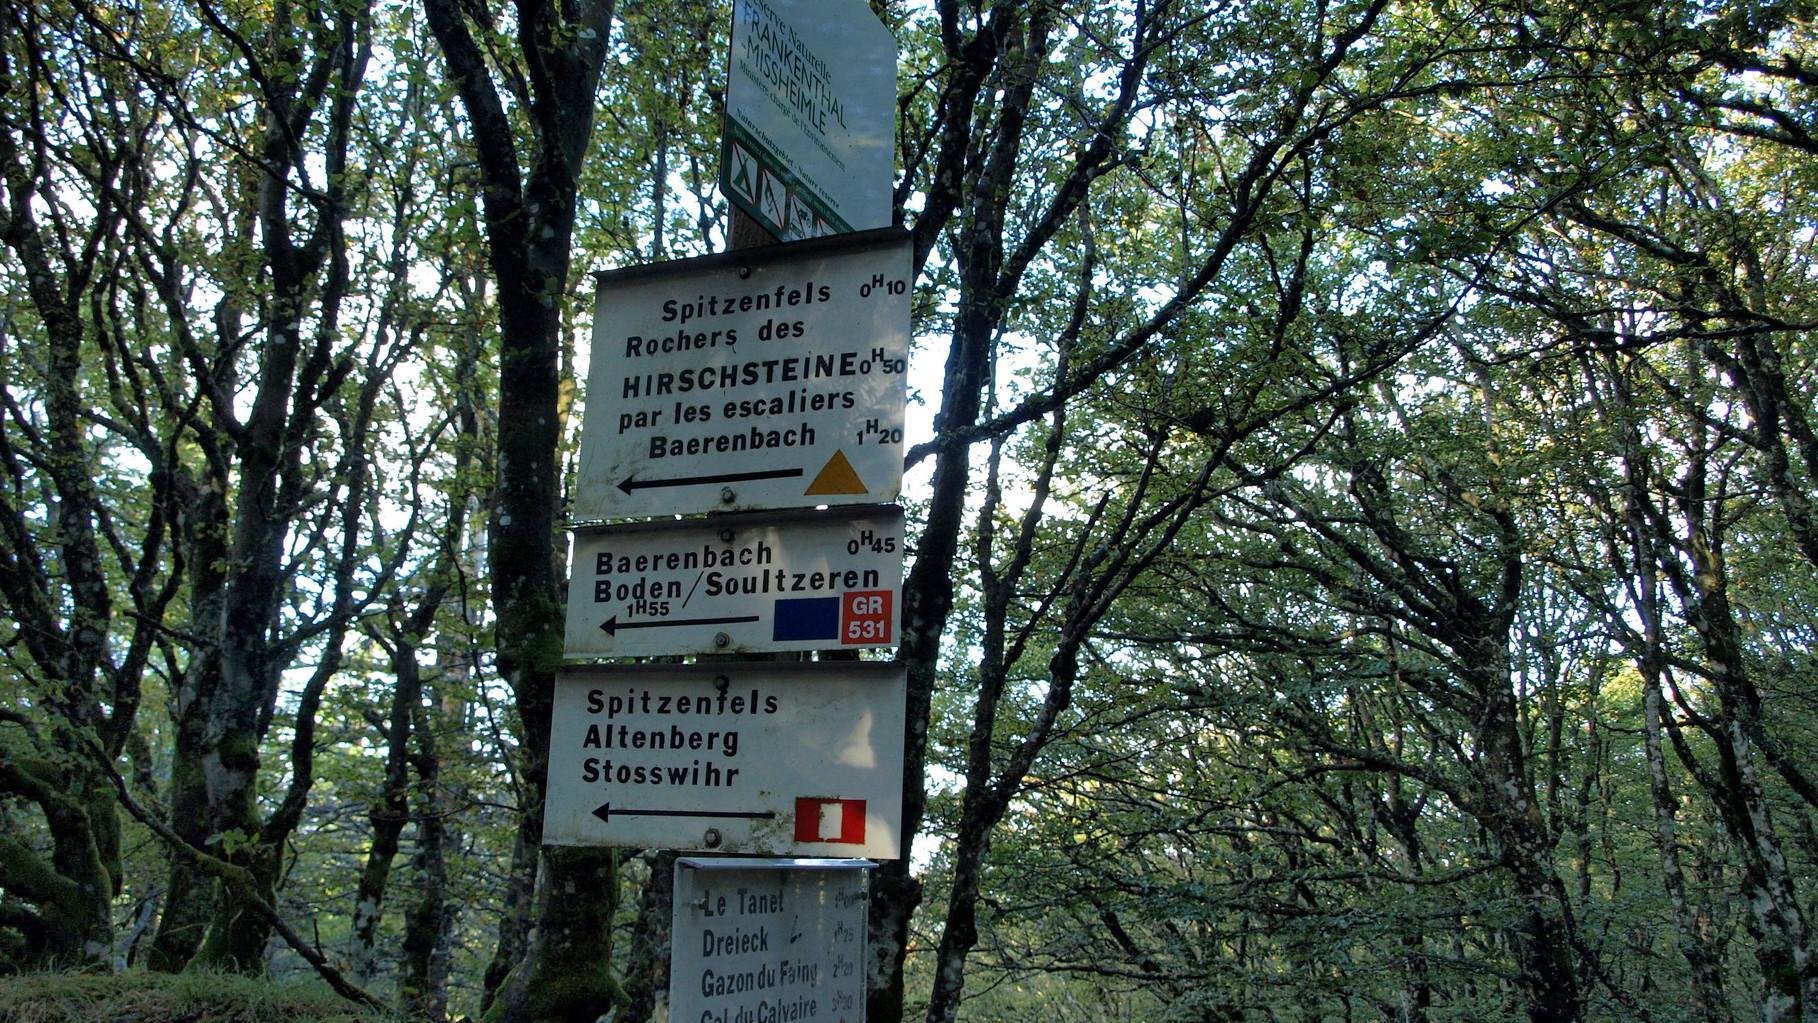 Prendre la direction Spitzenfels et Hirschsteine